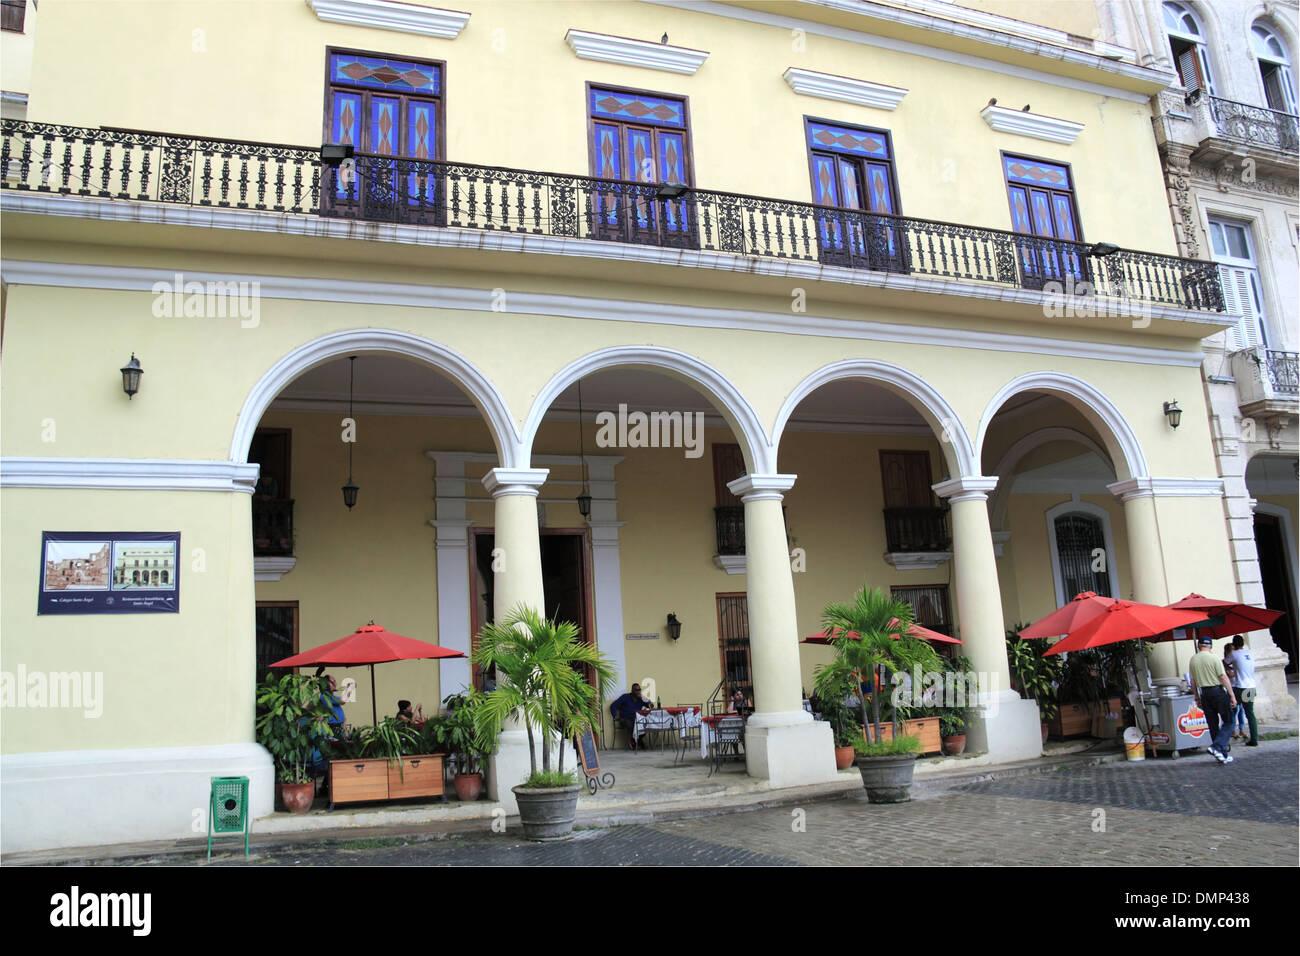 Hostal Santo Angel, Plaza Vieja, Old Havana (La Habana Vieja), Cuba, Caribbean Sea, Central America - Stock Image